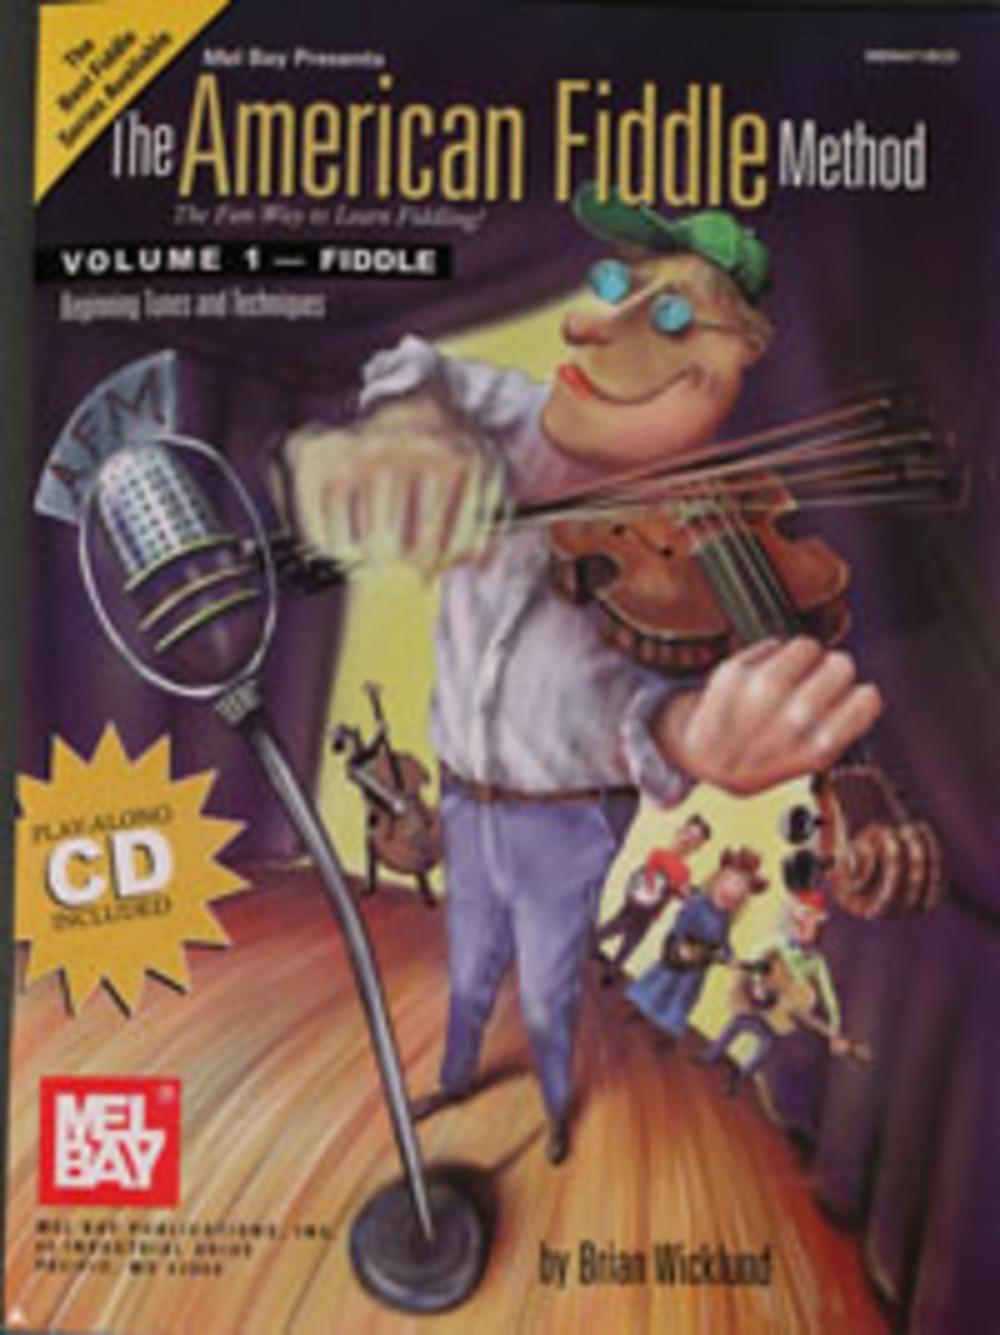 American Fiddle Method